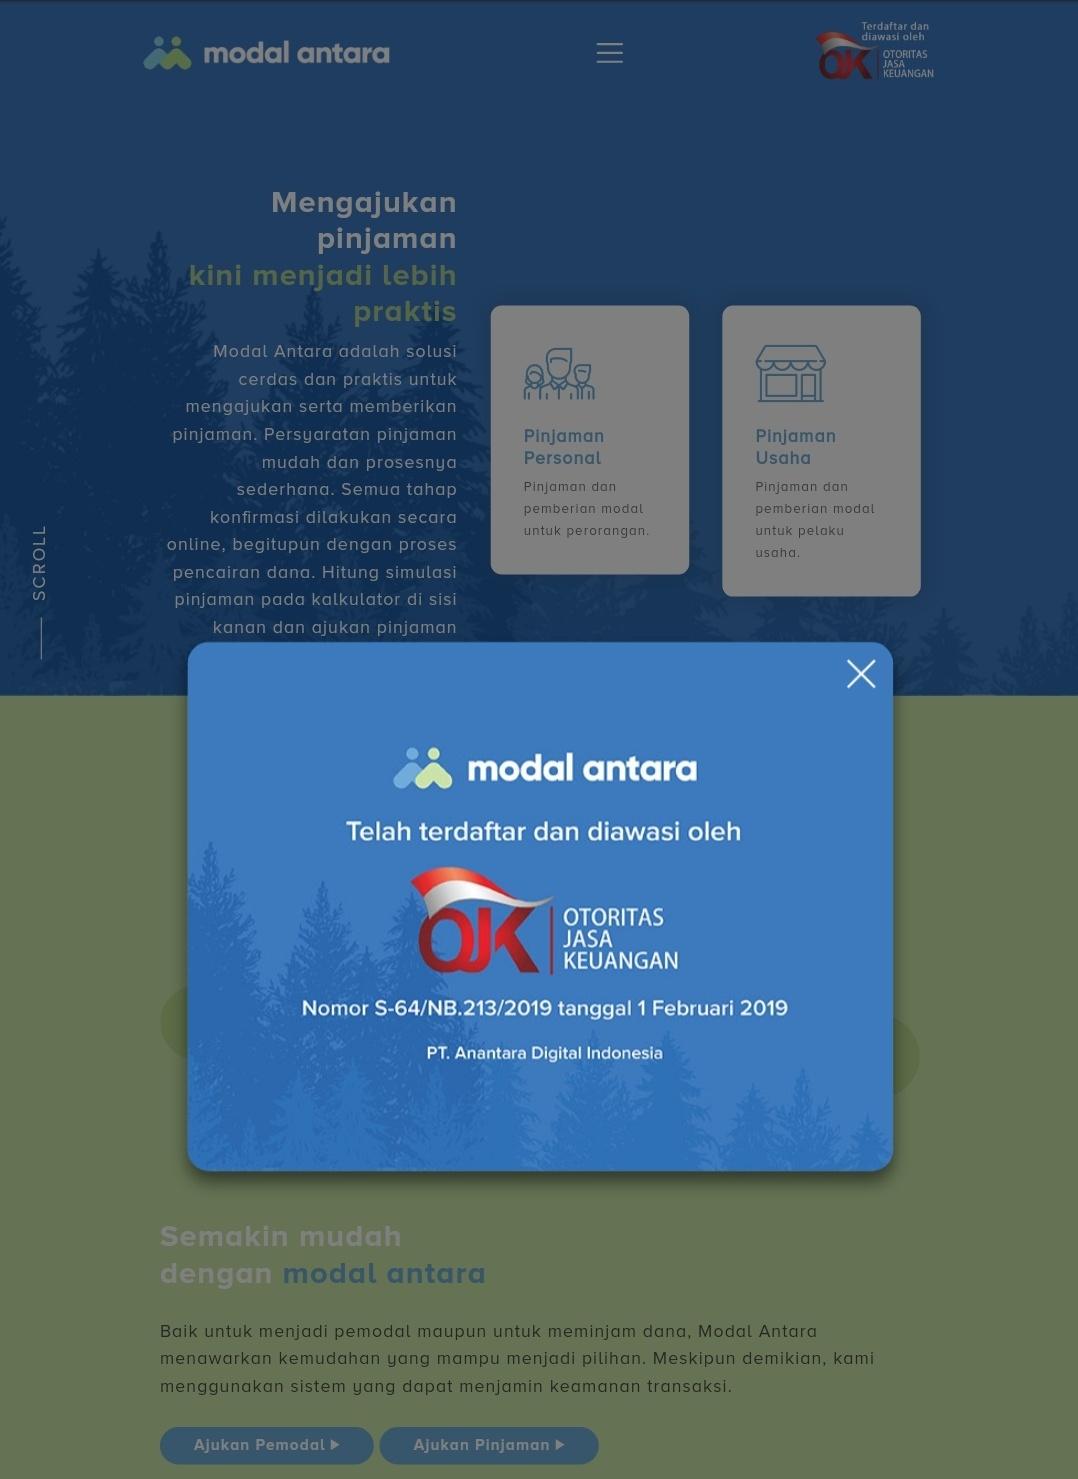 Modal Antara, salah satu fintech atau layanan pinjaman online yang terdaftar di OJK